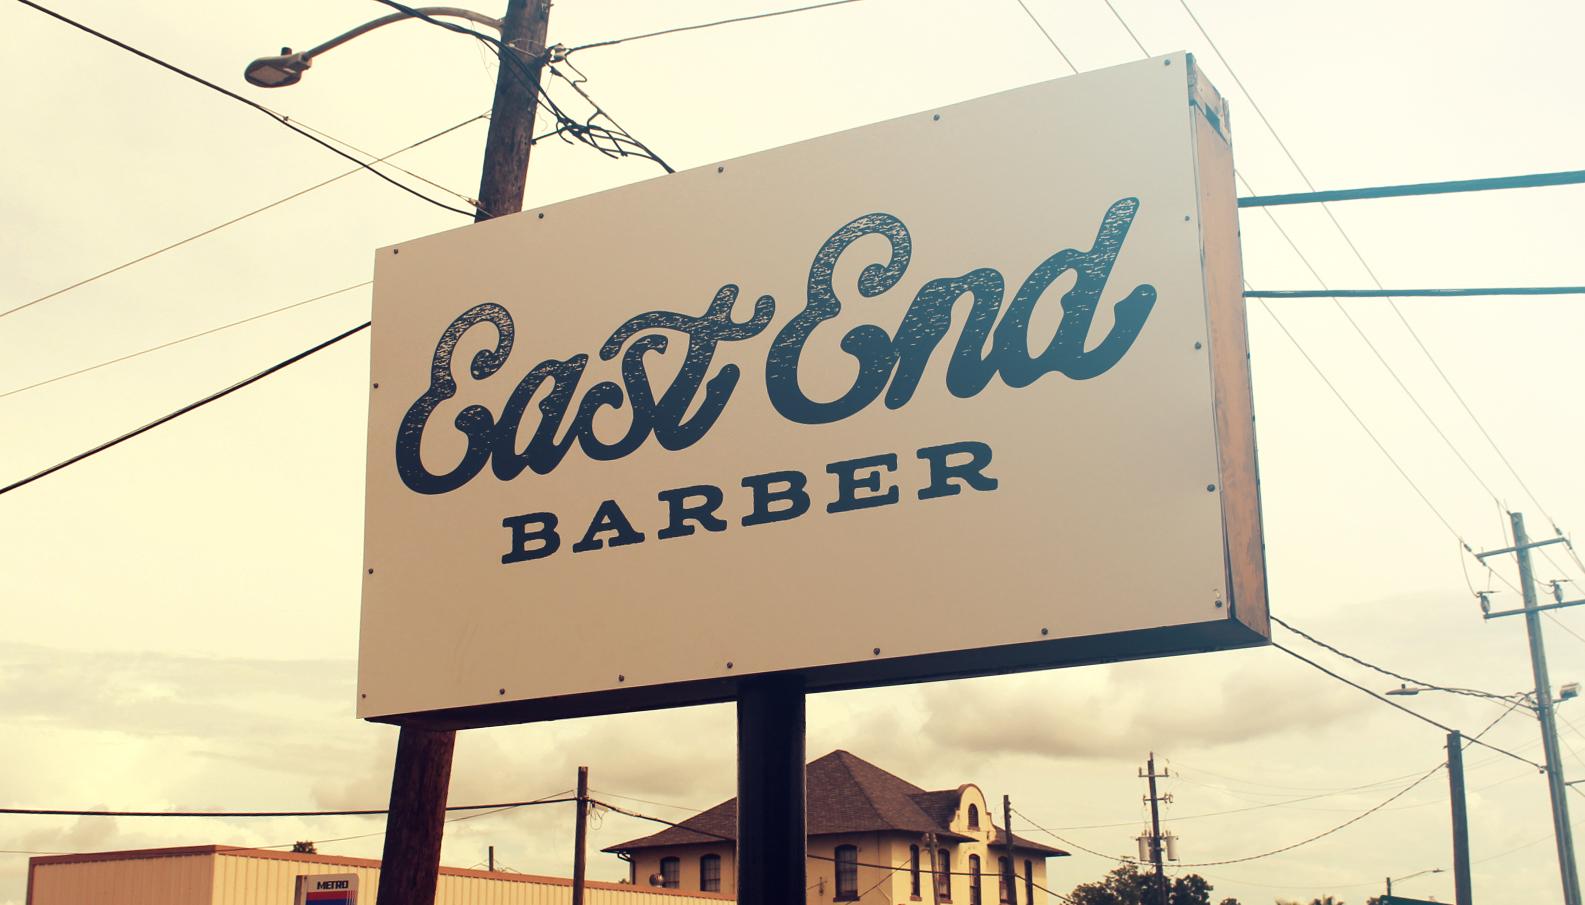 EAST END BARBER - HOUSTON, TEXAS